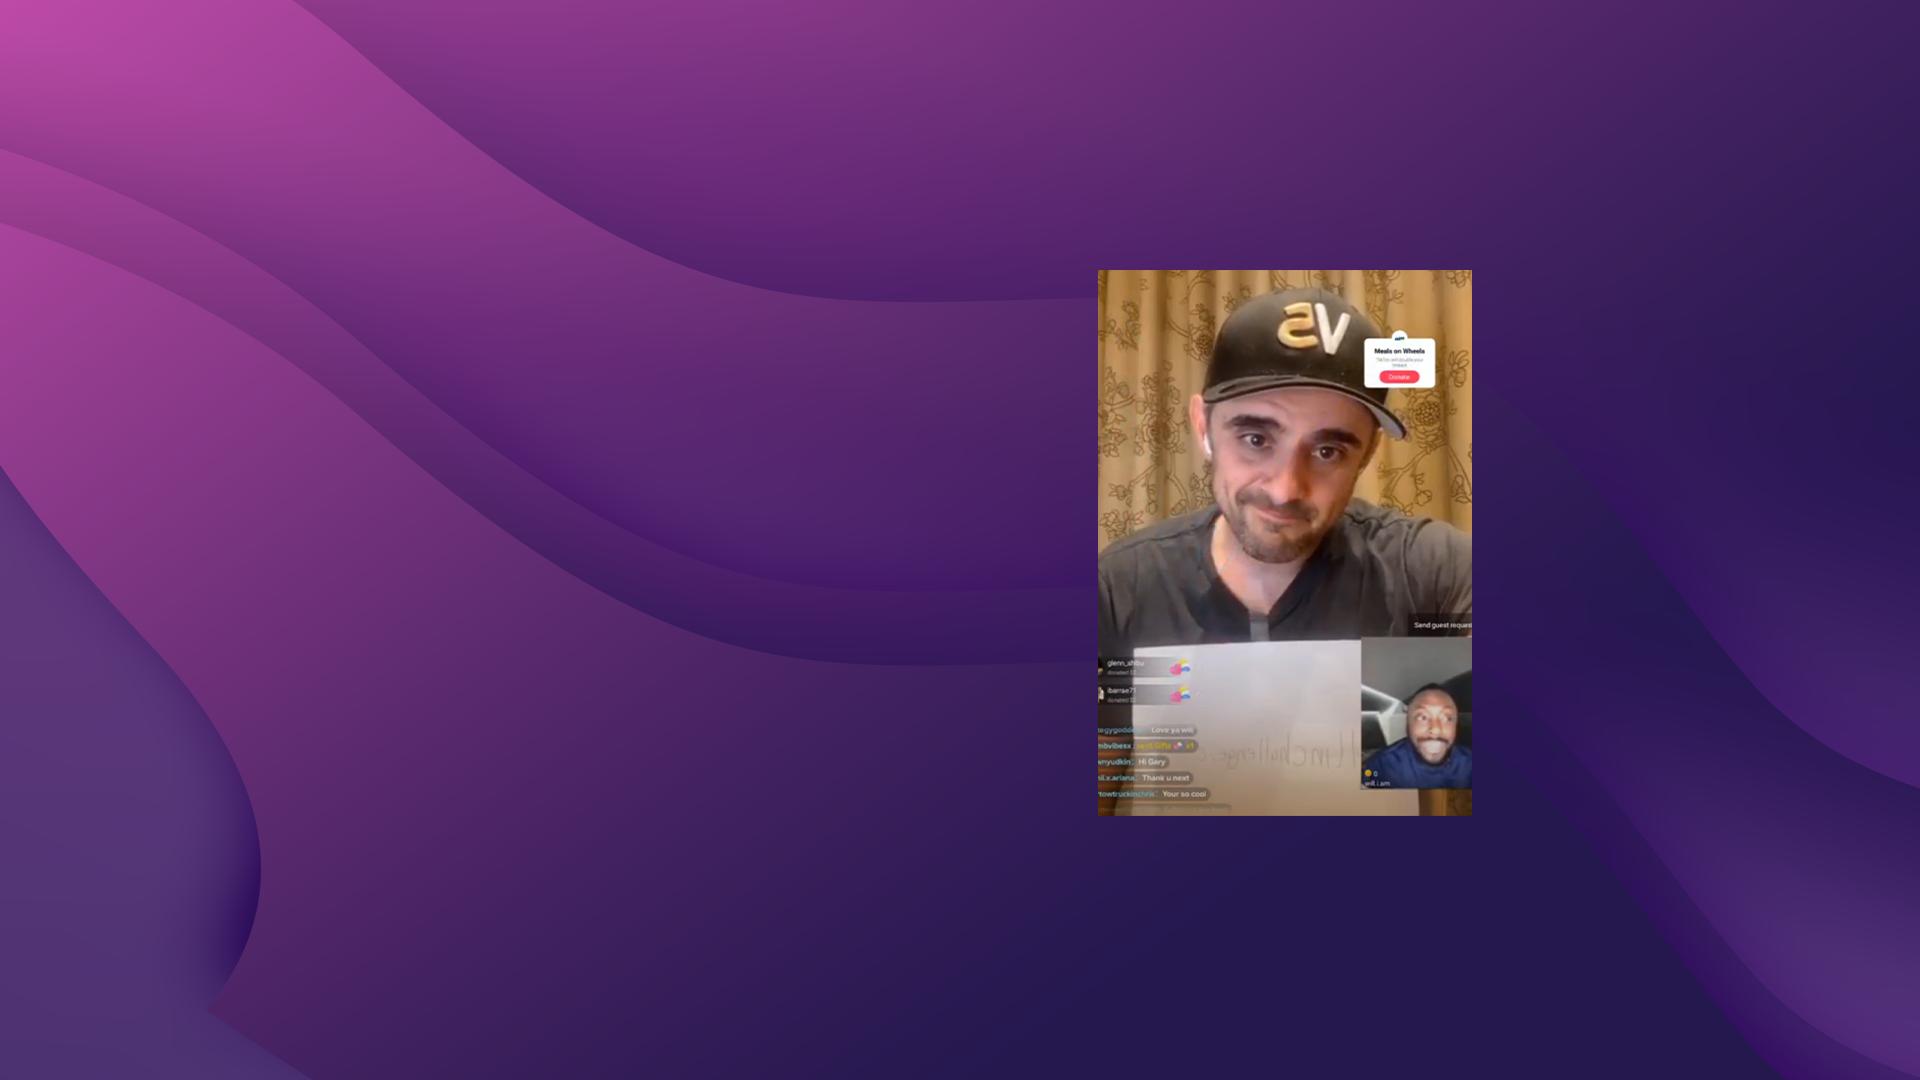 1222: Gary Vaynerchuk And The All In Challenge TikTok Telethon